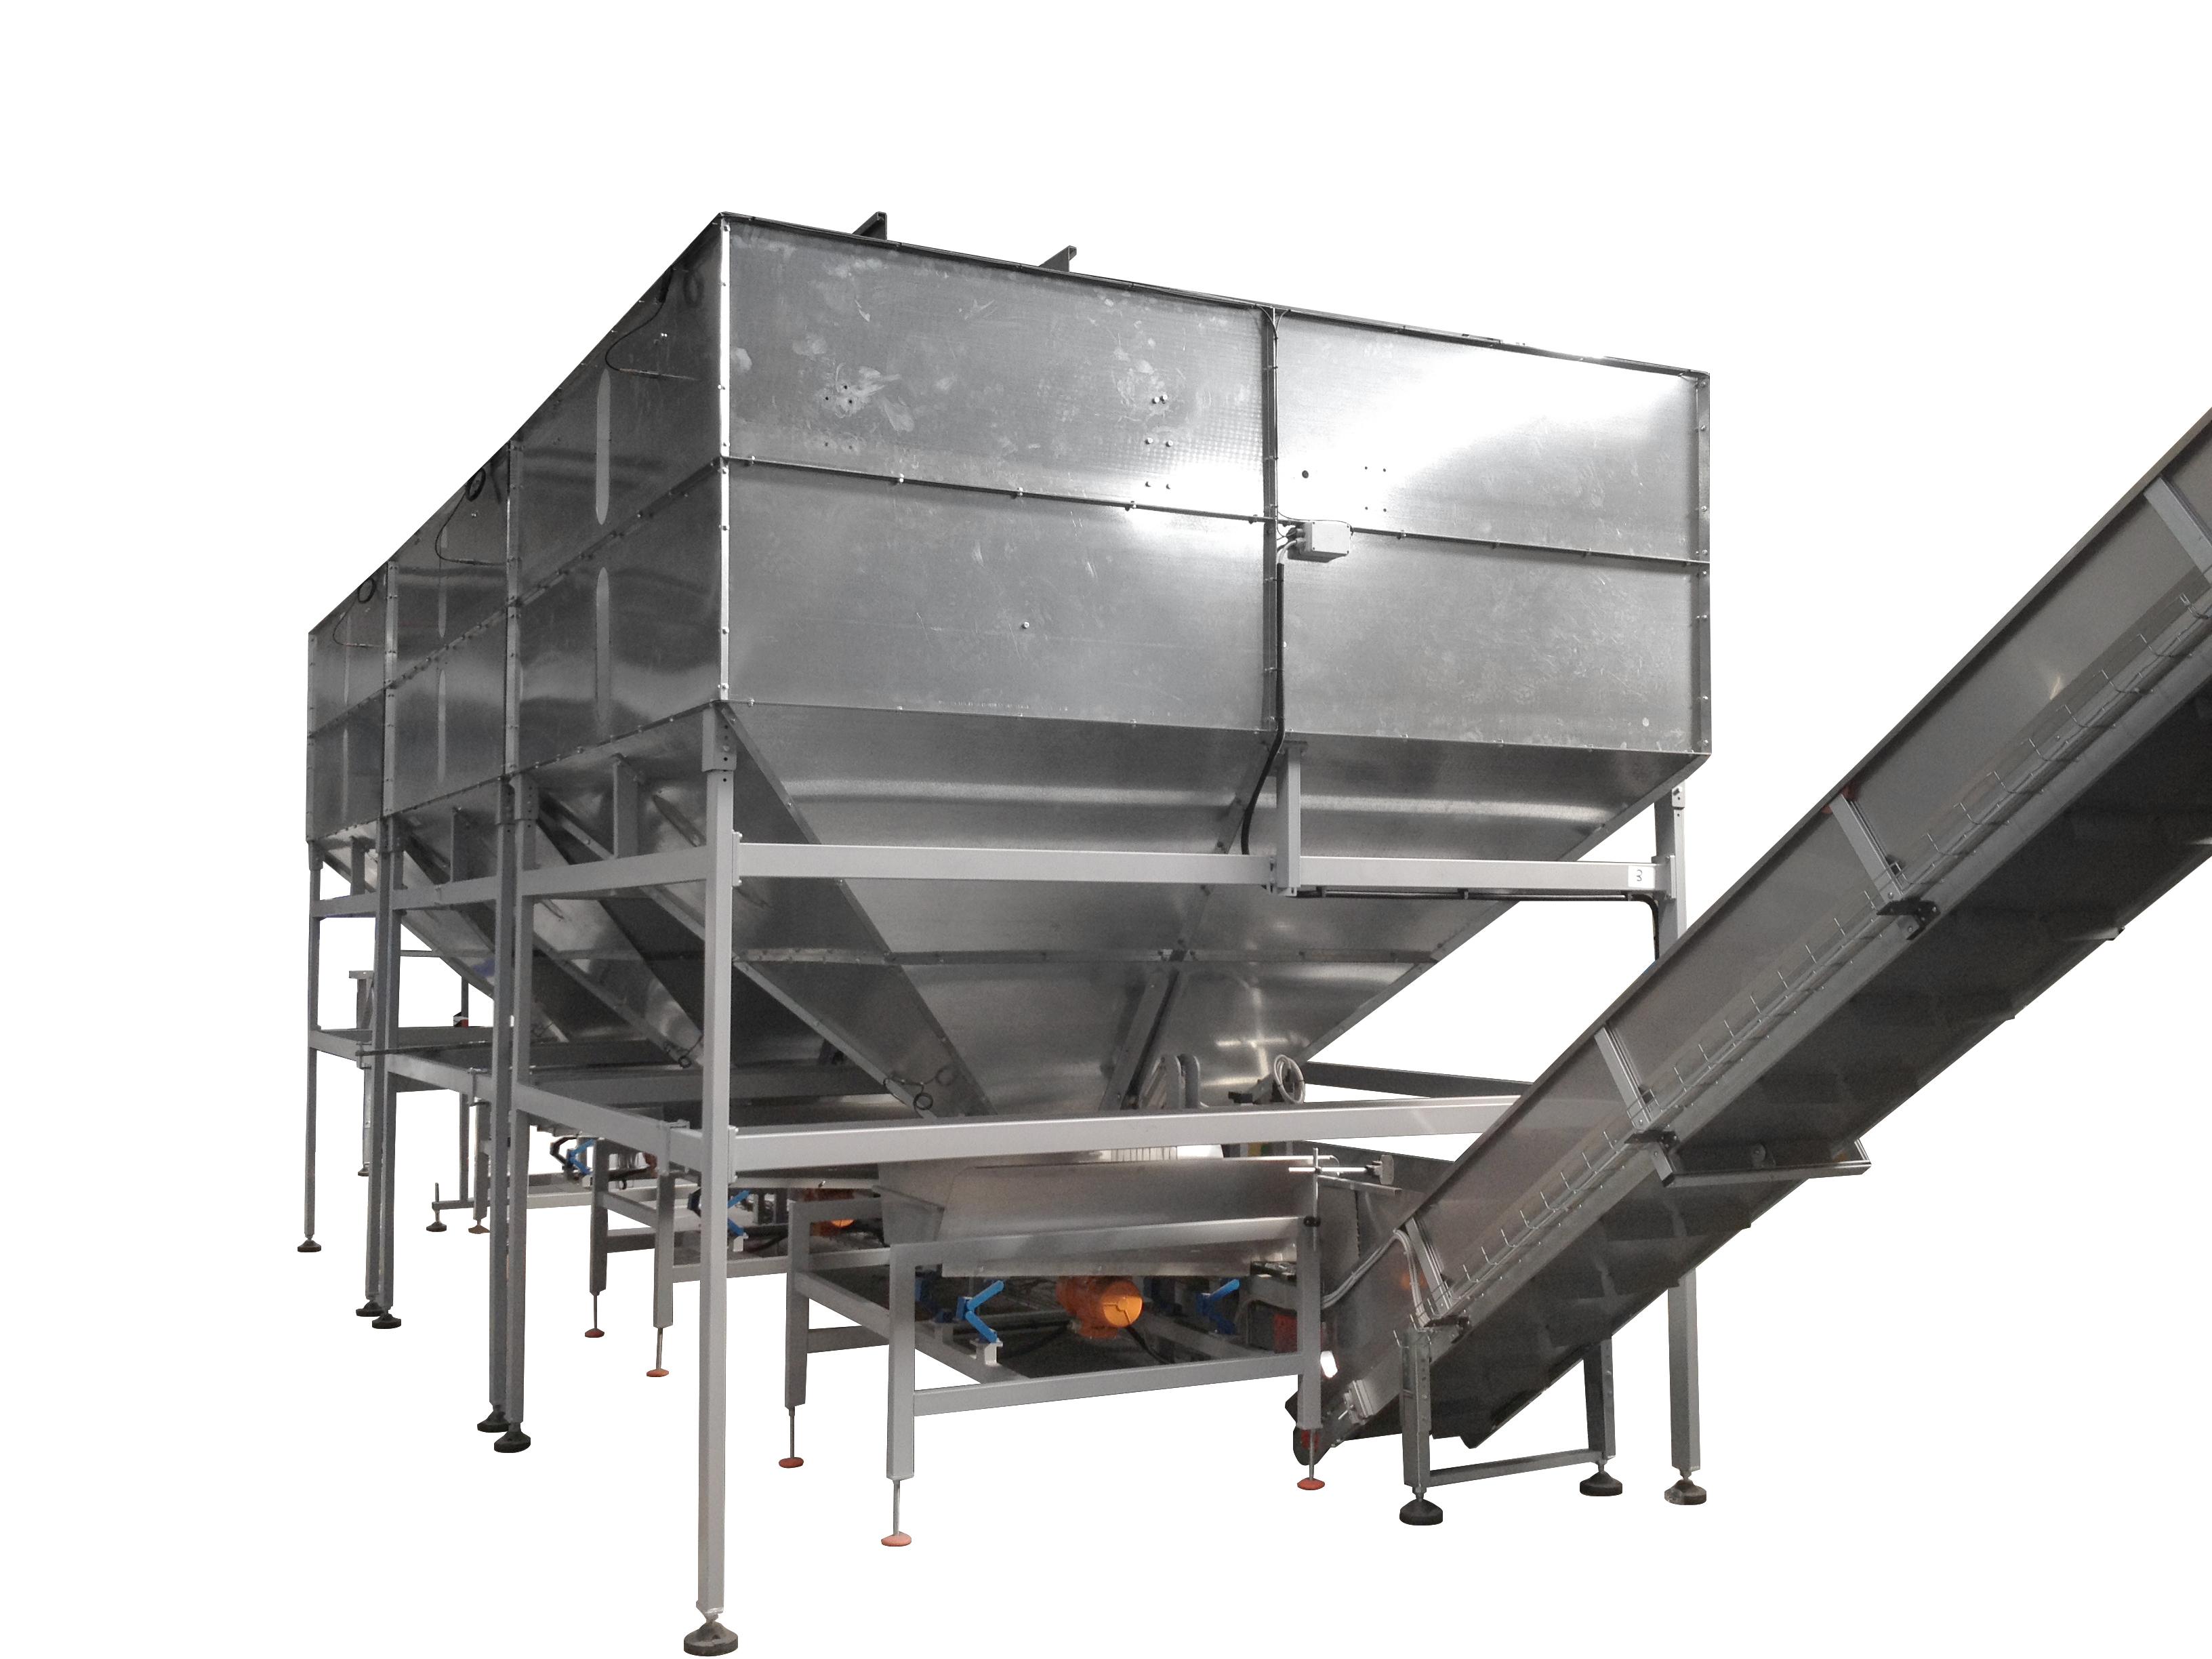 FV-Schüttgut-Behälter-PET-Verarbeitung